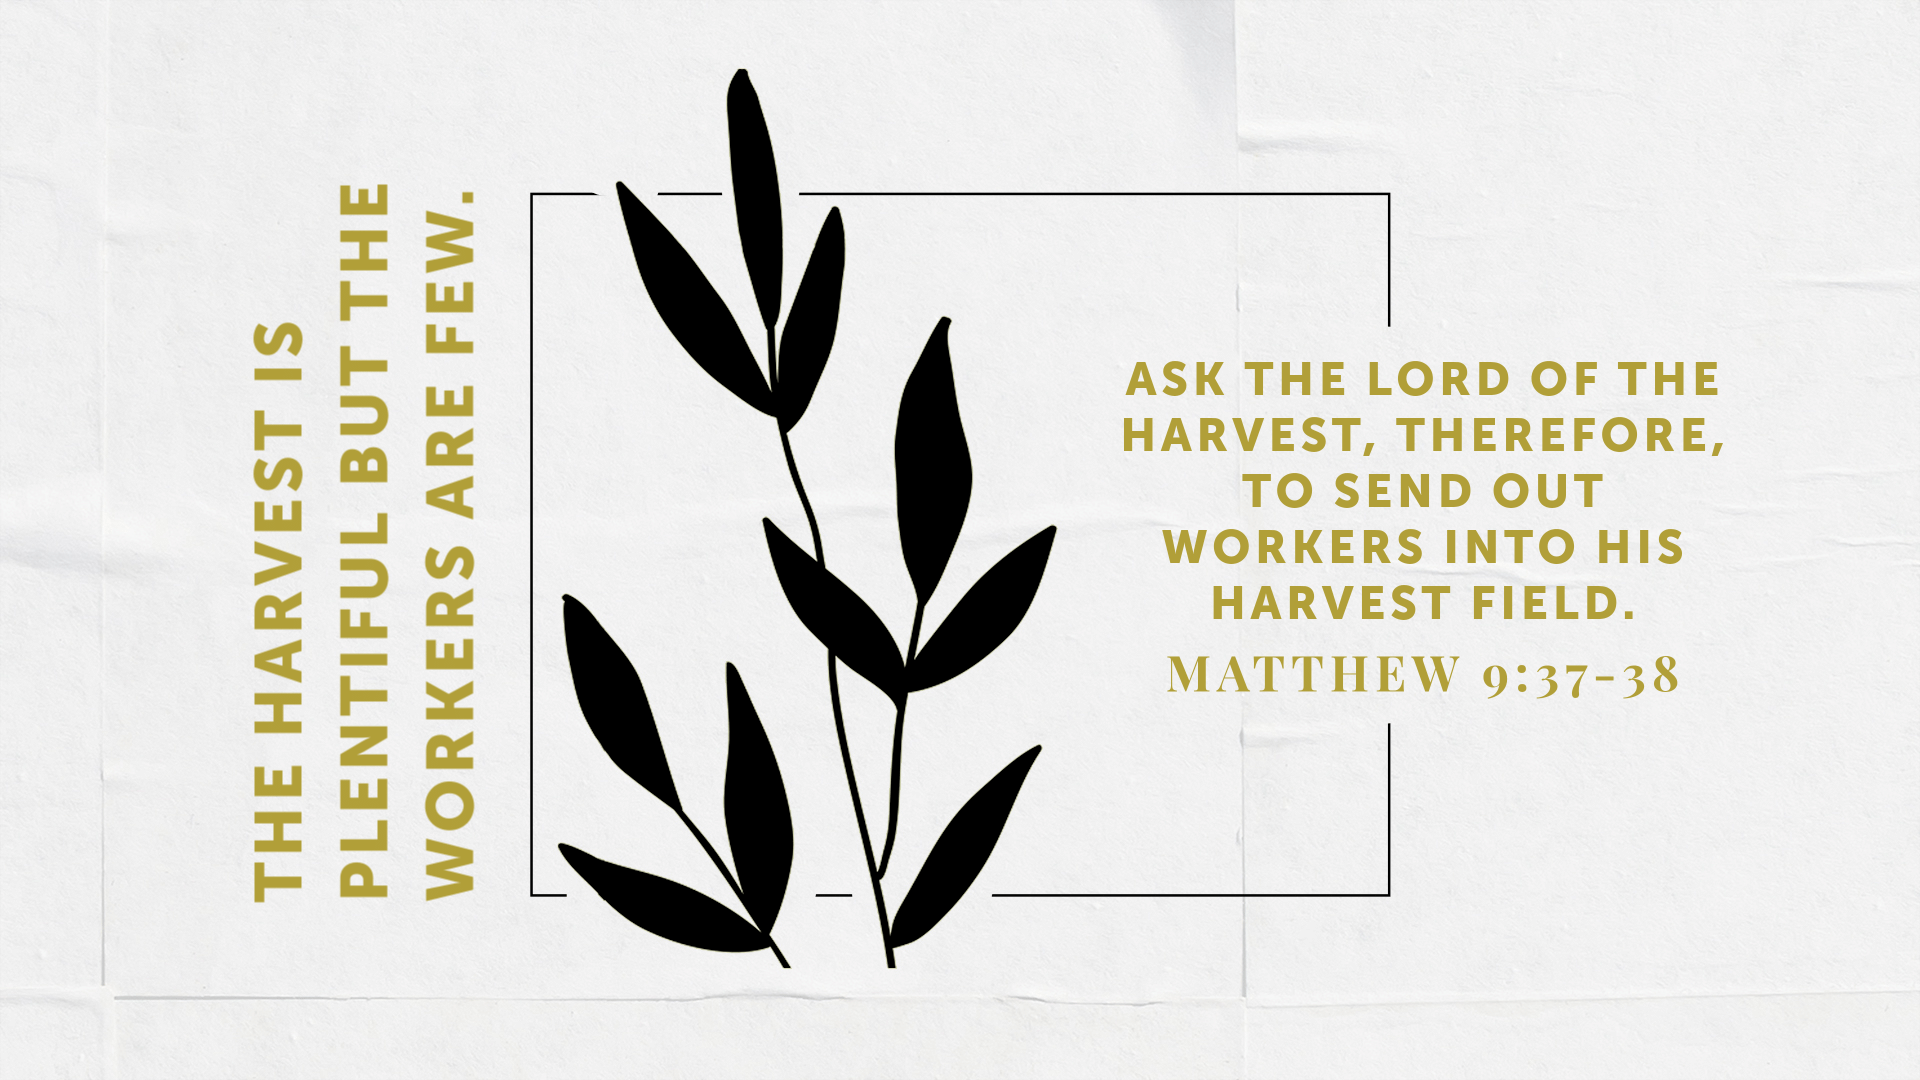 Preparing for Worship - October 4, 2020